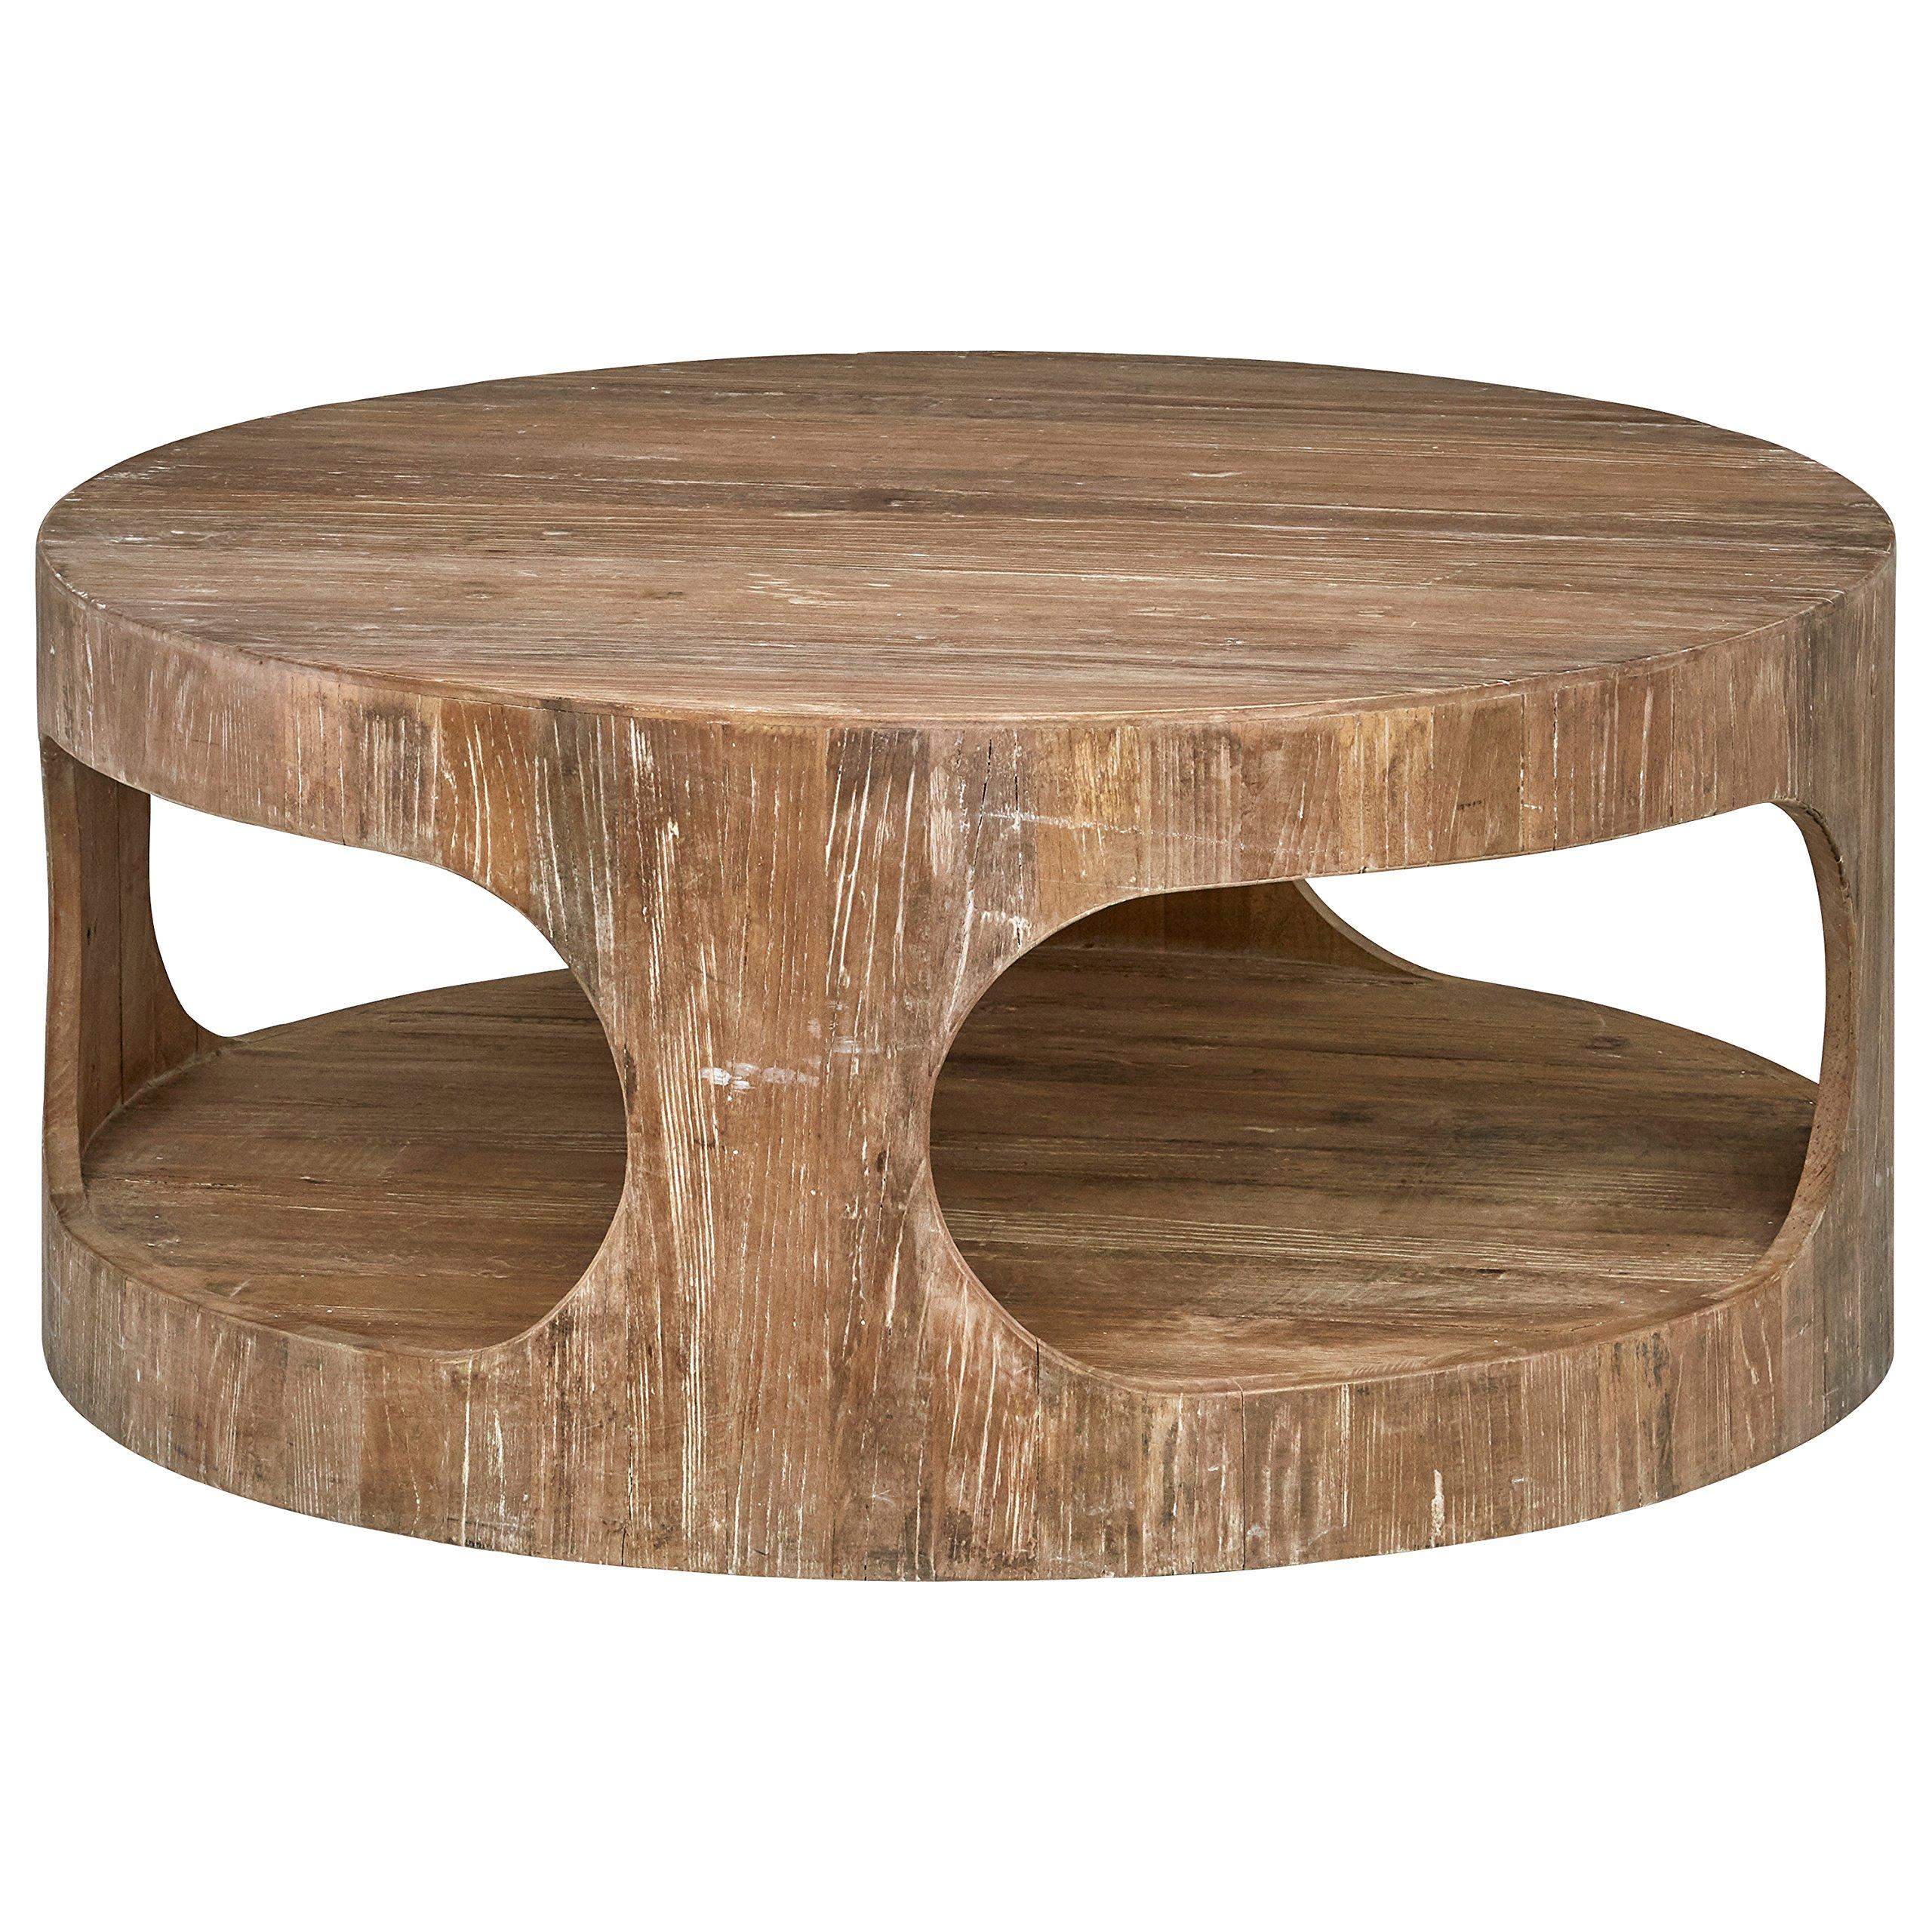 Stone & Beam Miramar Elm Wood Cutout Coffee Table, 39.4''D, Natural by Stone & Beam